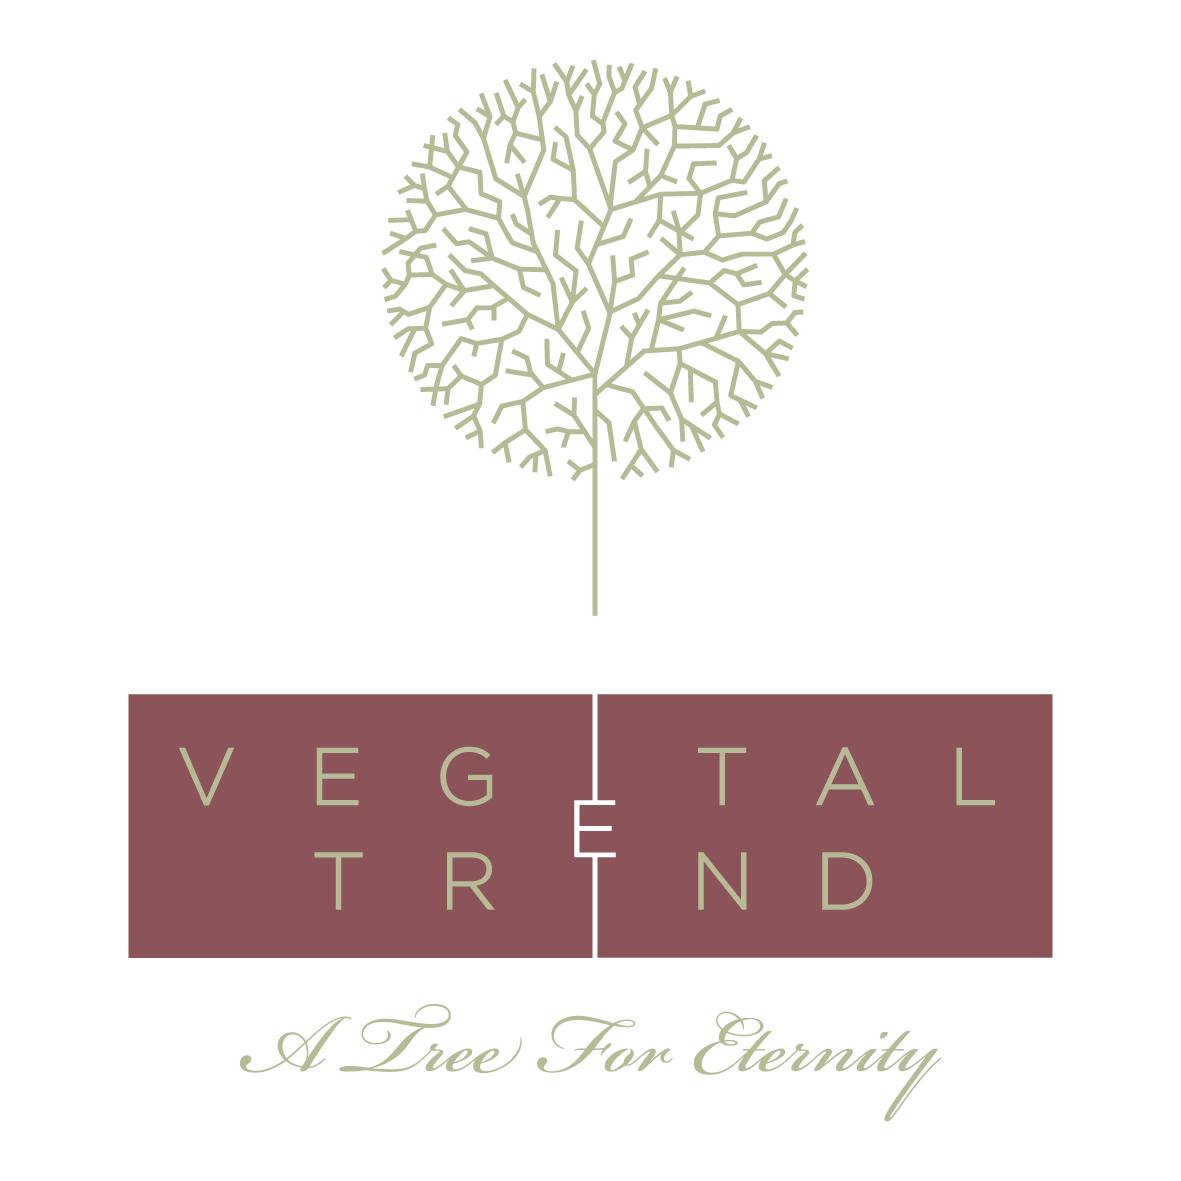 Vegetal Trend